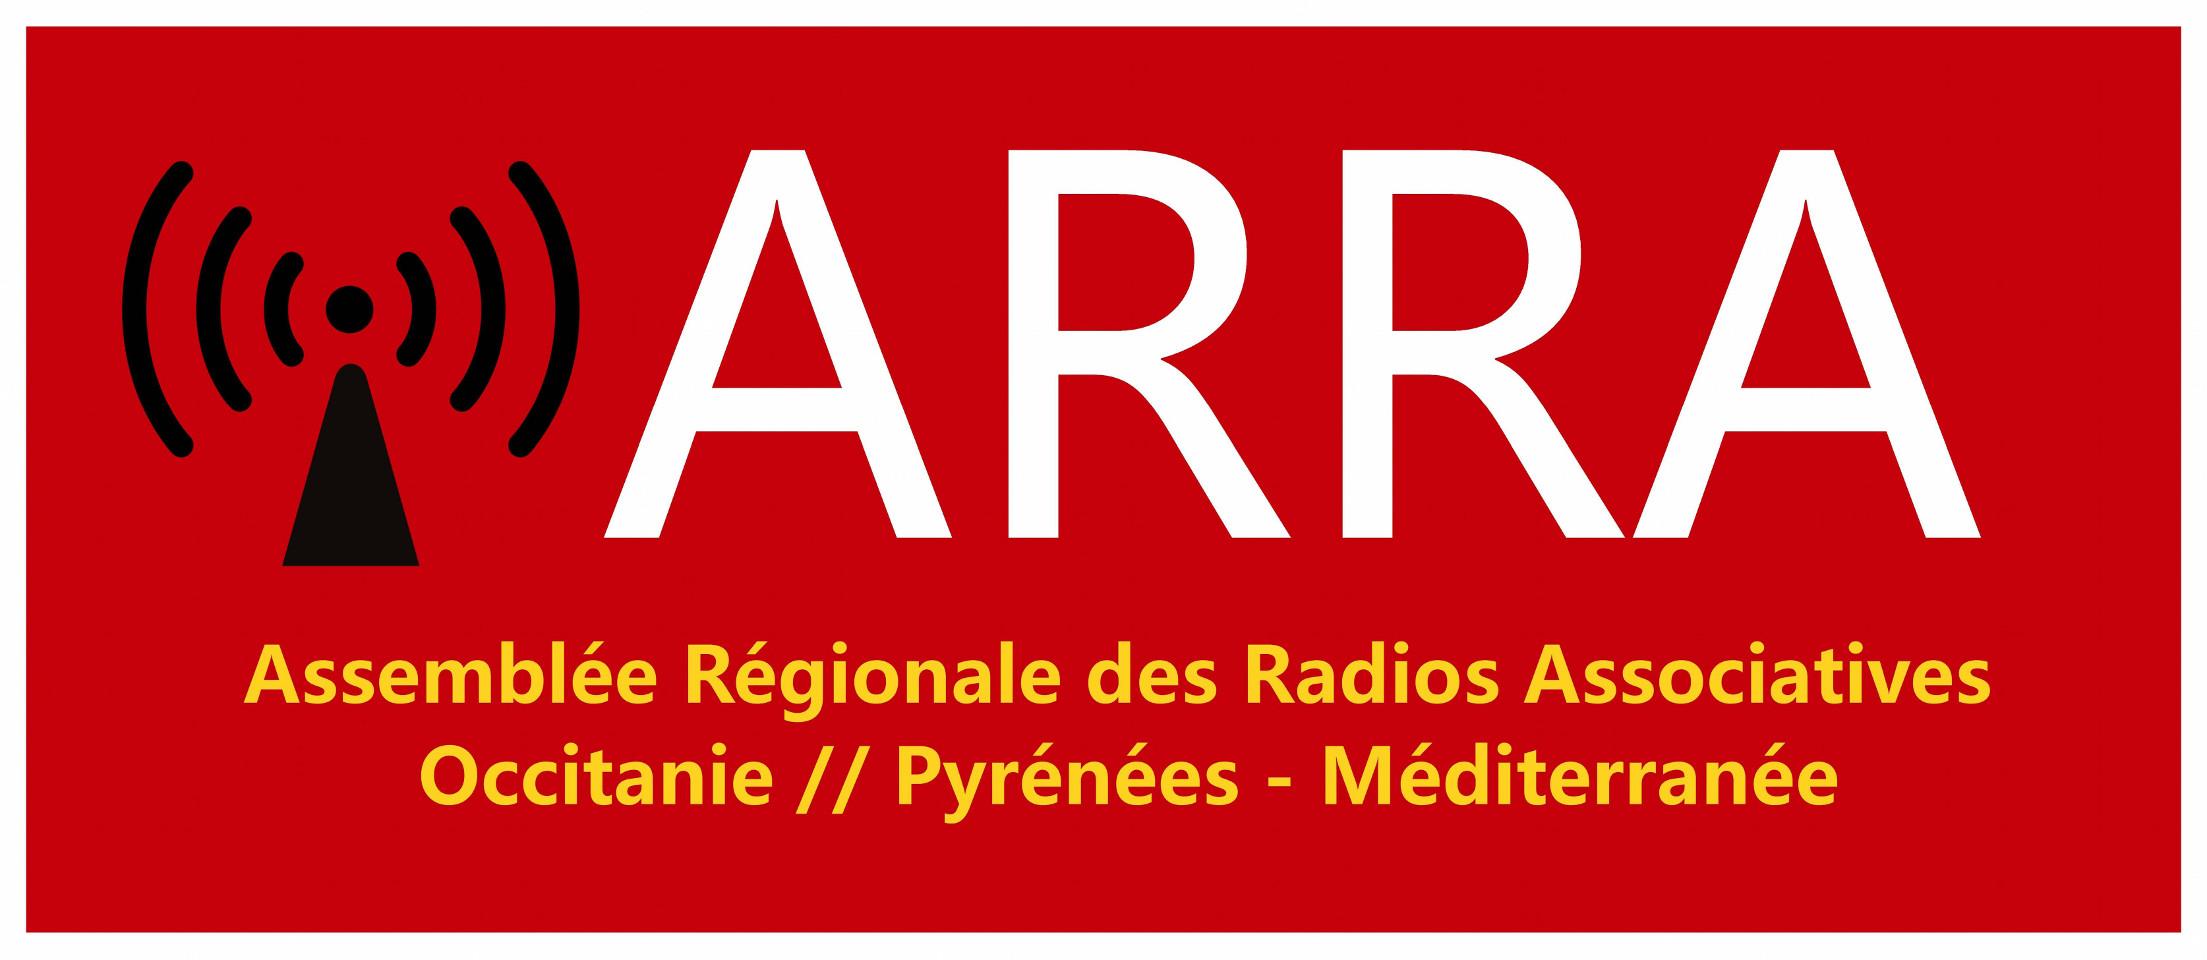 ARRA radios associatives